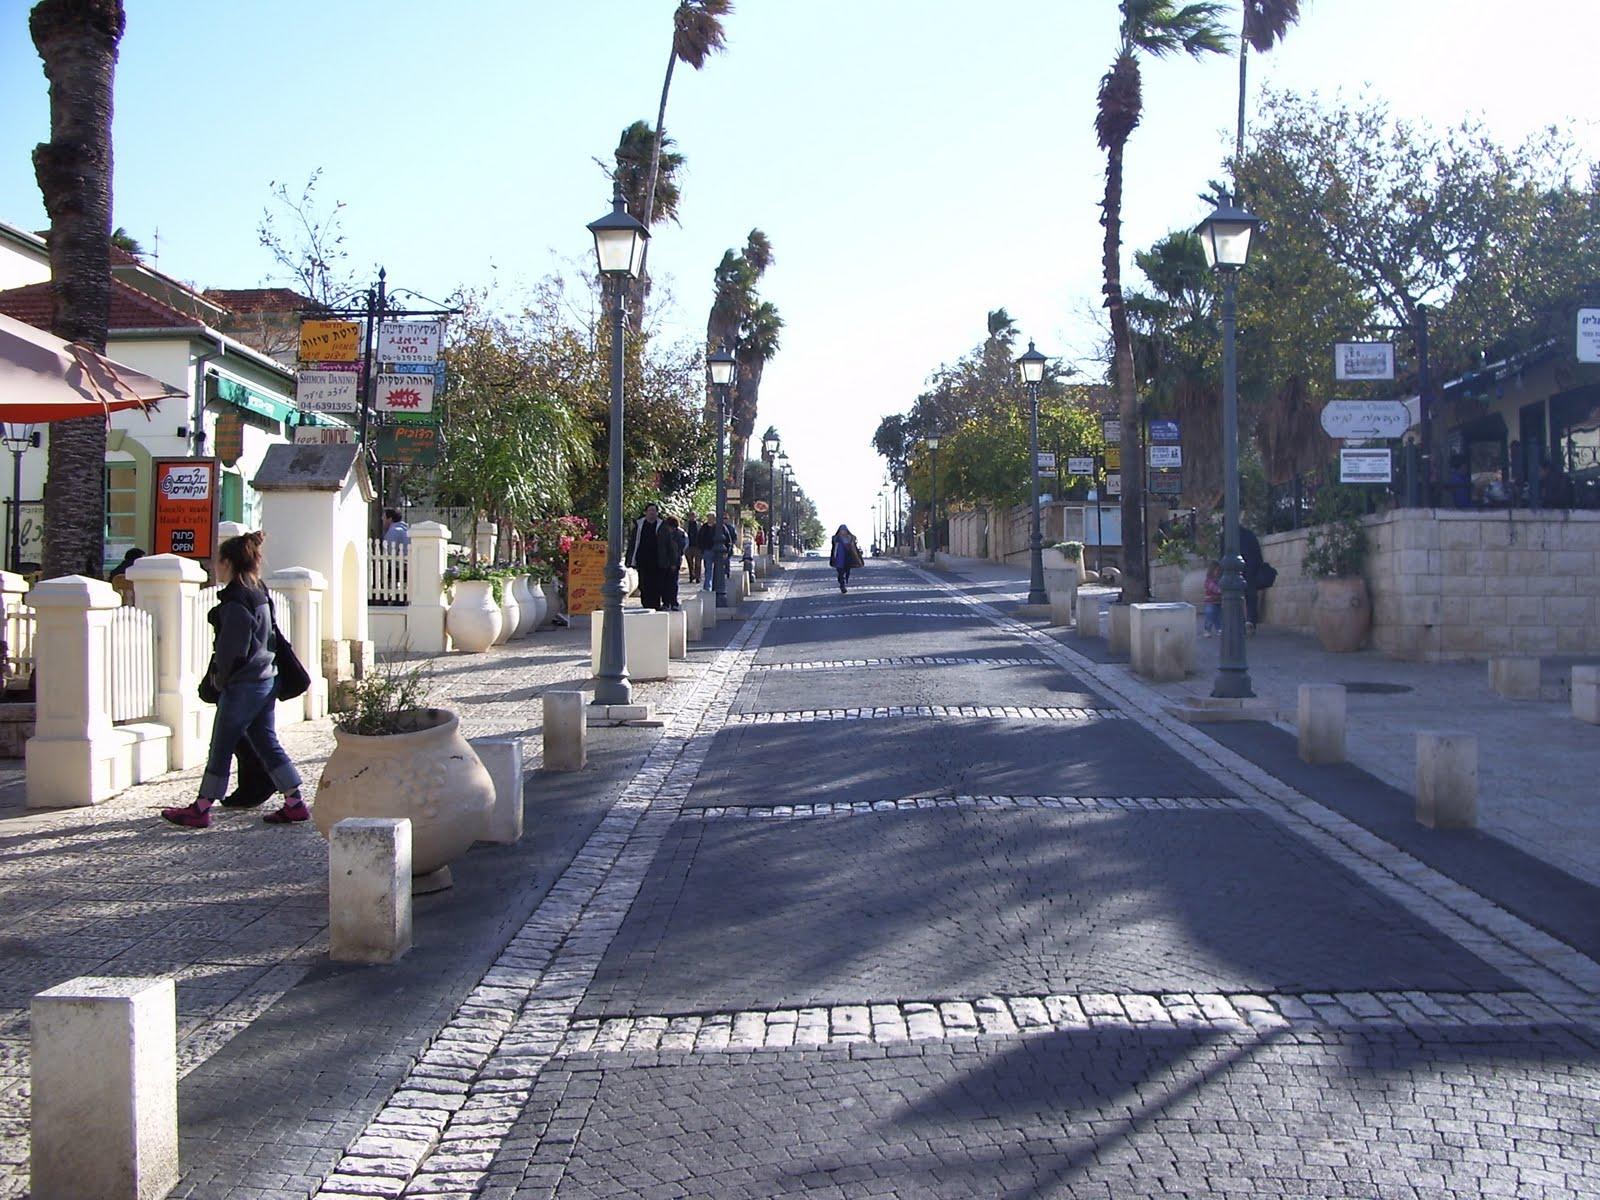 Mazkeret Batya Israel  city photos gallery : Zikhron Yaacov Mazkeret Batya Turismo Israel